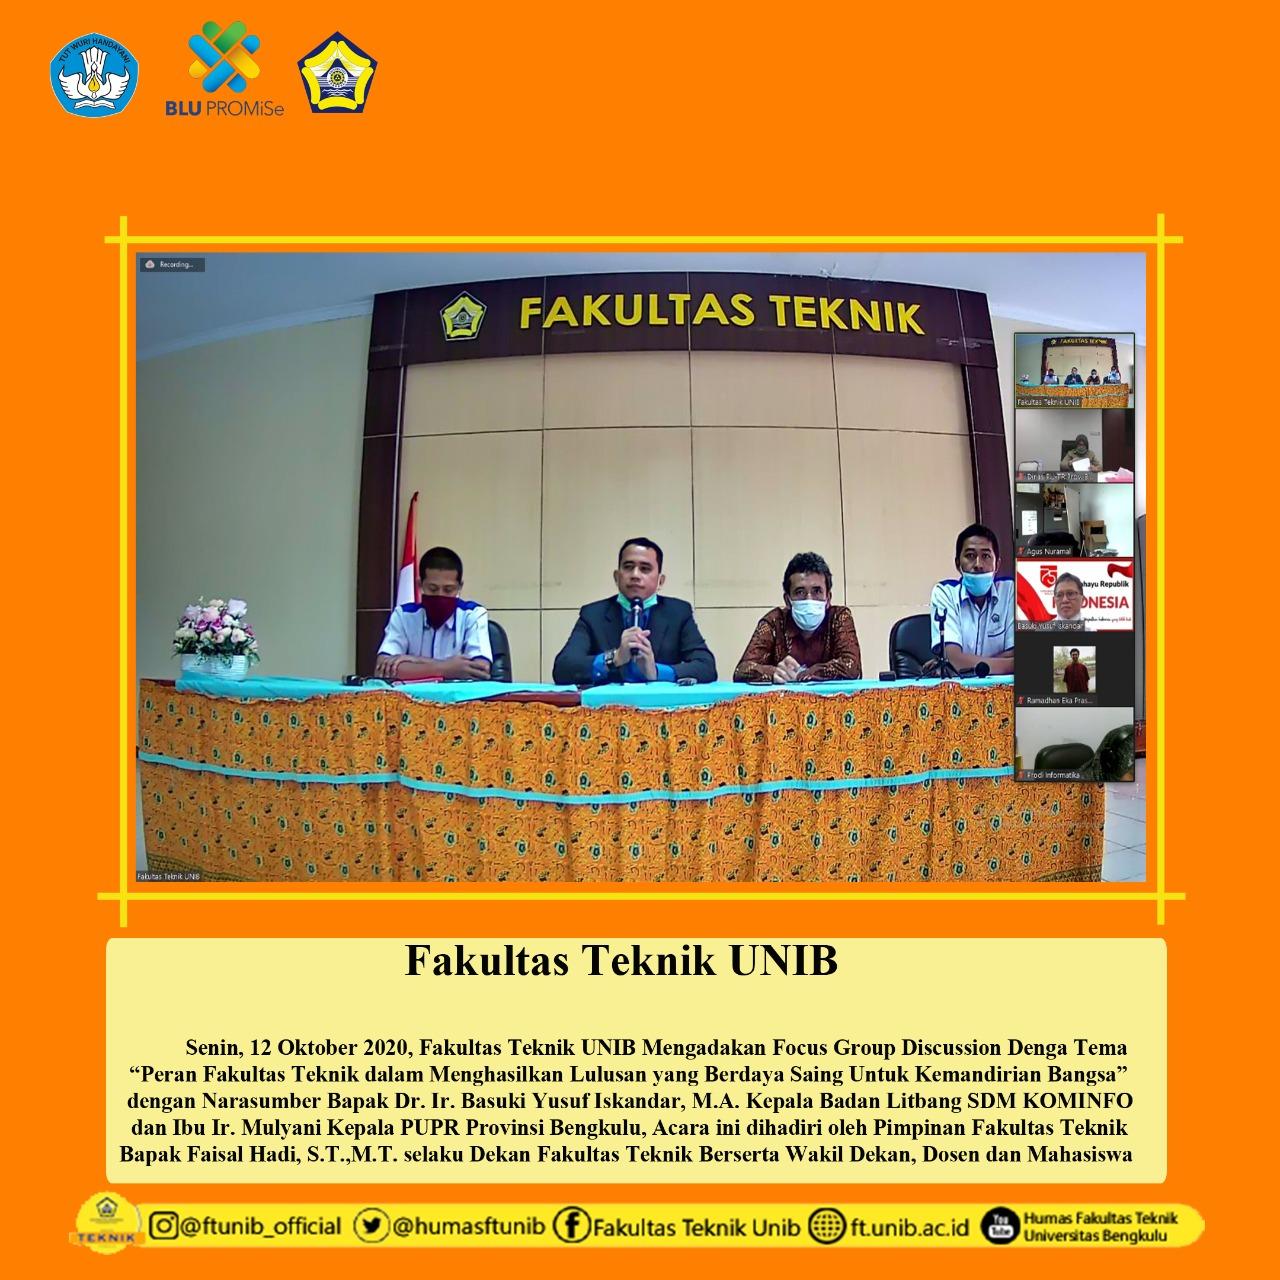 Fakultas Teknik Menyelenggarakan FGD Dengan Narasumber Dari Kominfo